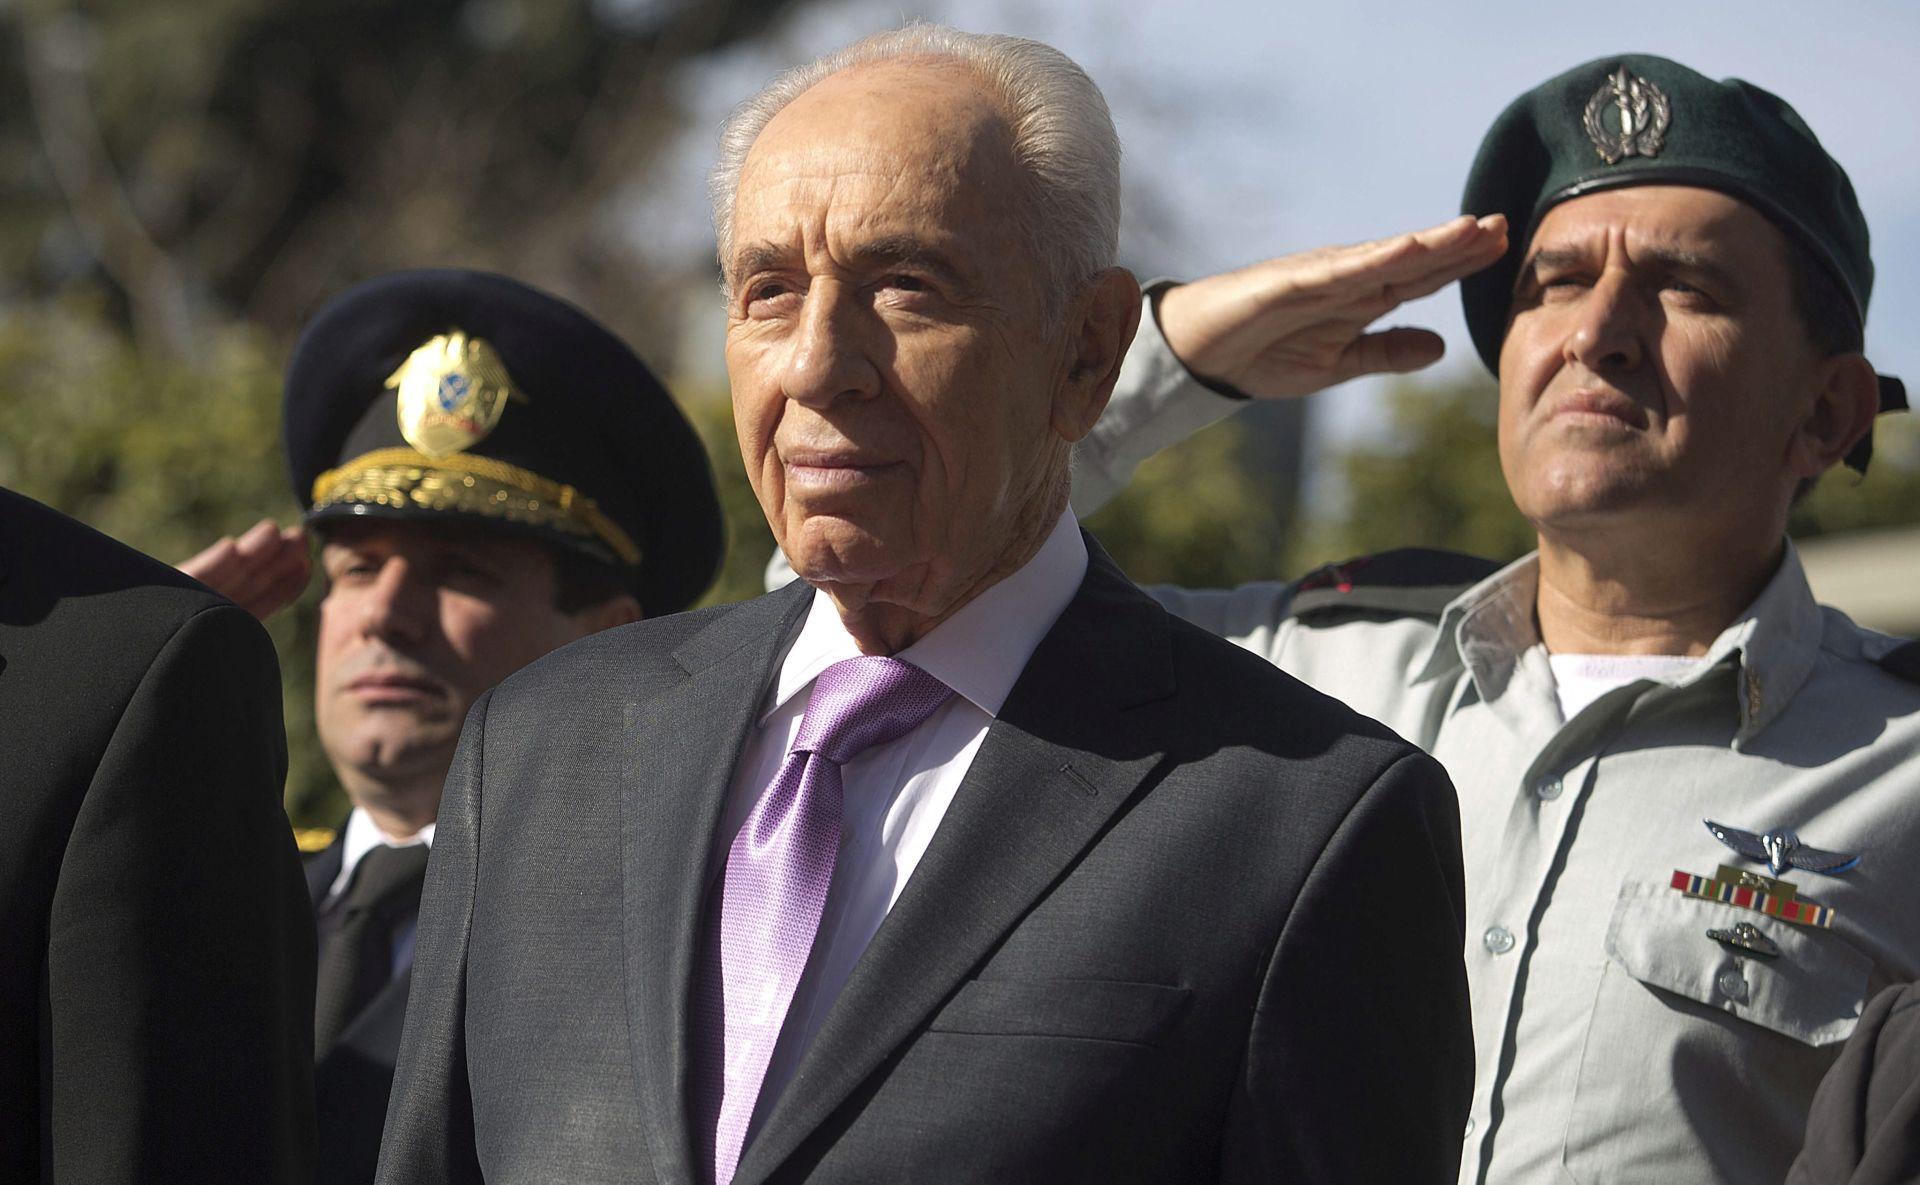 SVIJET O PERESOVOJ SMRTI 'Otišao je zagovornik mira'